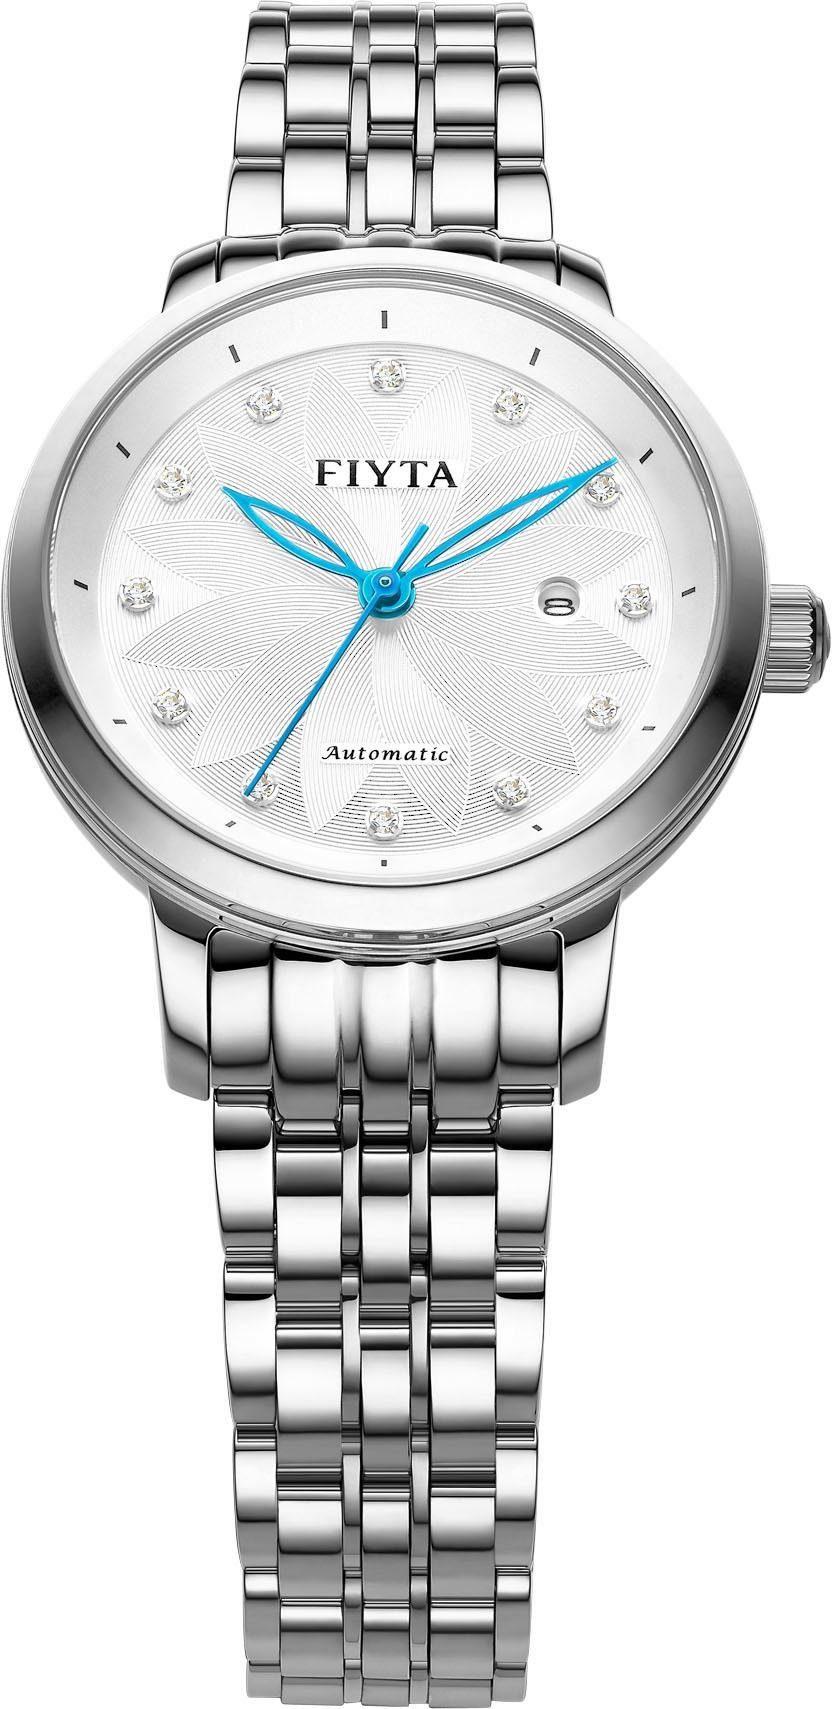 FIYTA Automatikuhr Floriography LA802007WWW | Uhren > Automatikuhren | Fiyta